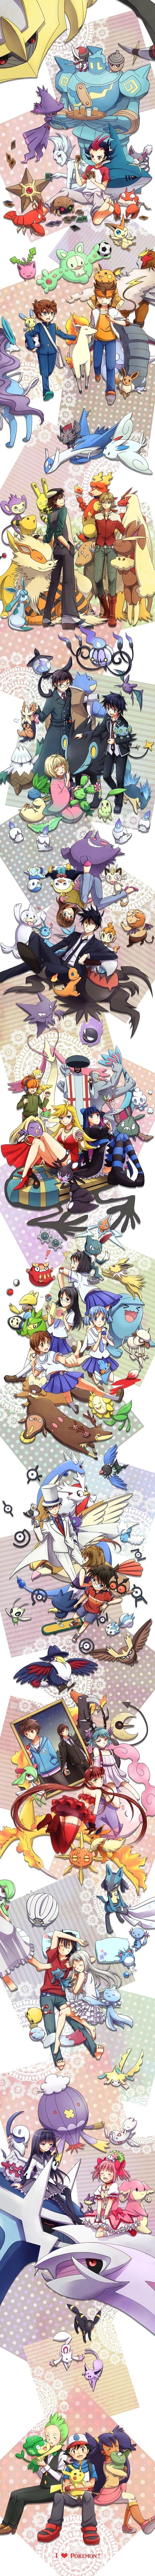 Pokemon Cross - Over  Yu-Gi-Oh! Zexal, Inazuma Eleven GO, Tiger & Bunny, Blue Exorcist, Yondemasu yo Azazel-san, Panty & Stocking with Garterbelt, Nichijou, Detective Conan, C-Control, Anohana: The Flower We Saw That Day, Puella Magi Madoka Magica, Pokemon.